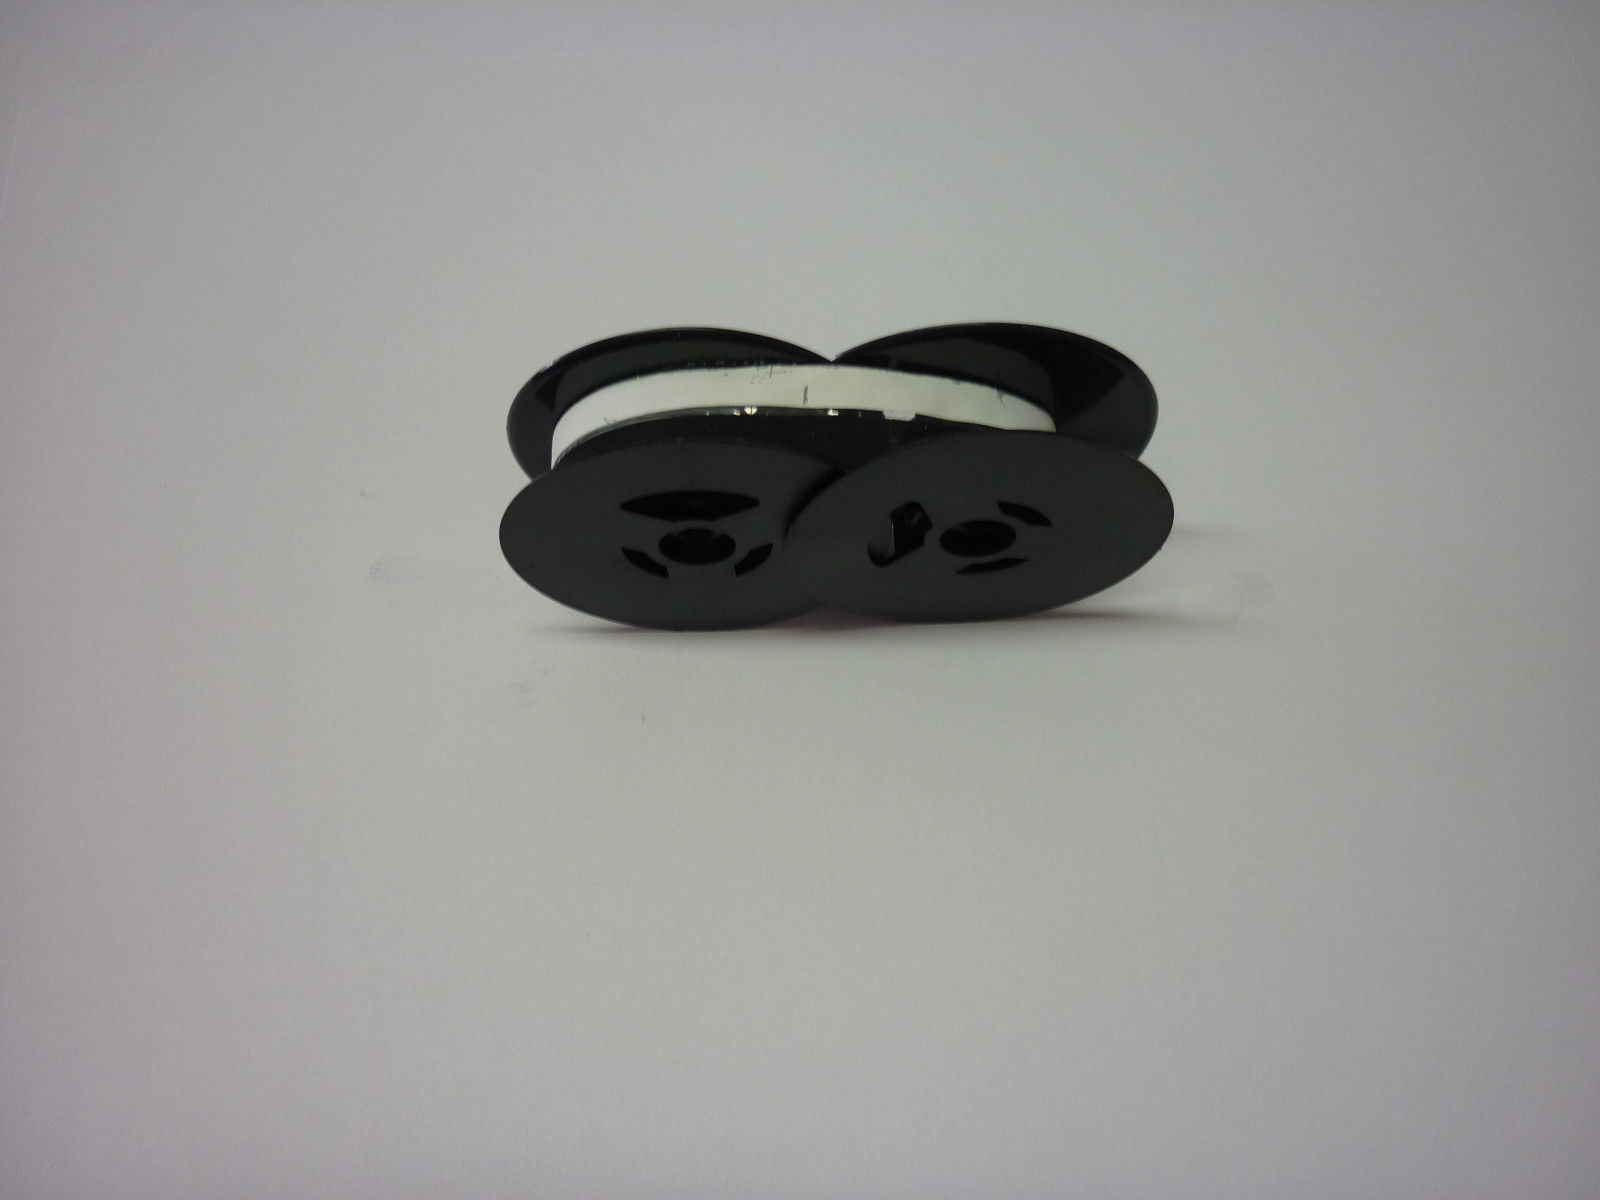 Underwood 555 Standard Typewriter Ribbon Black and White Correcting Twin Spool